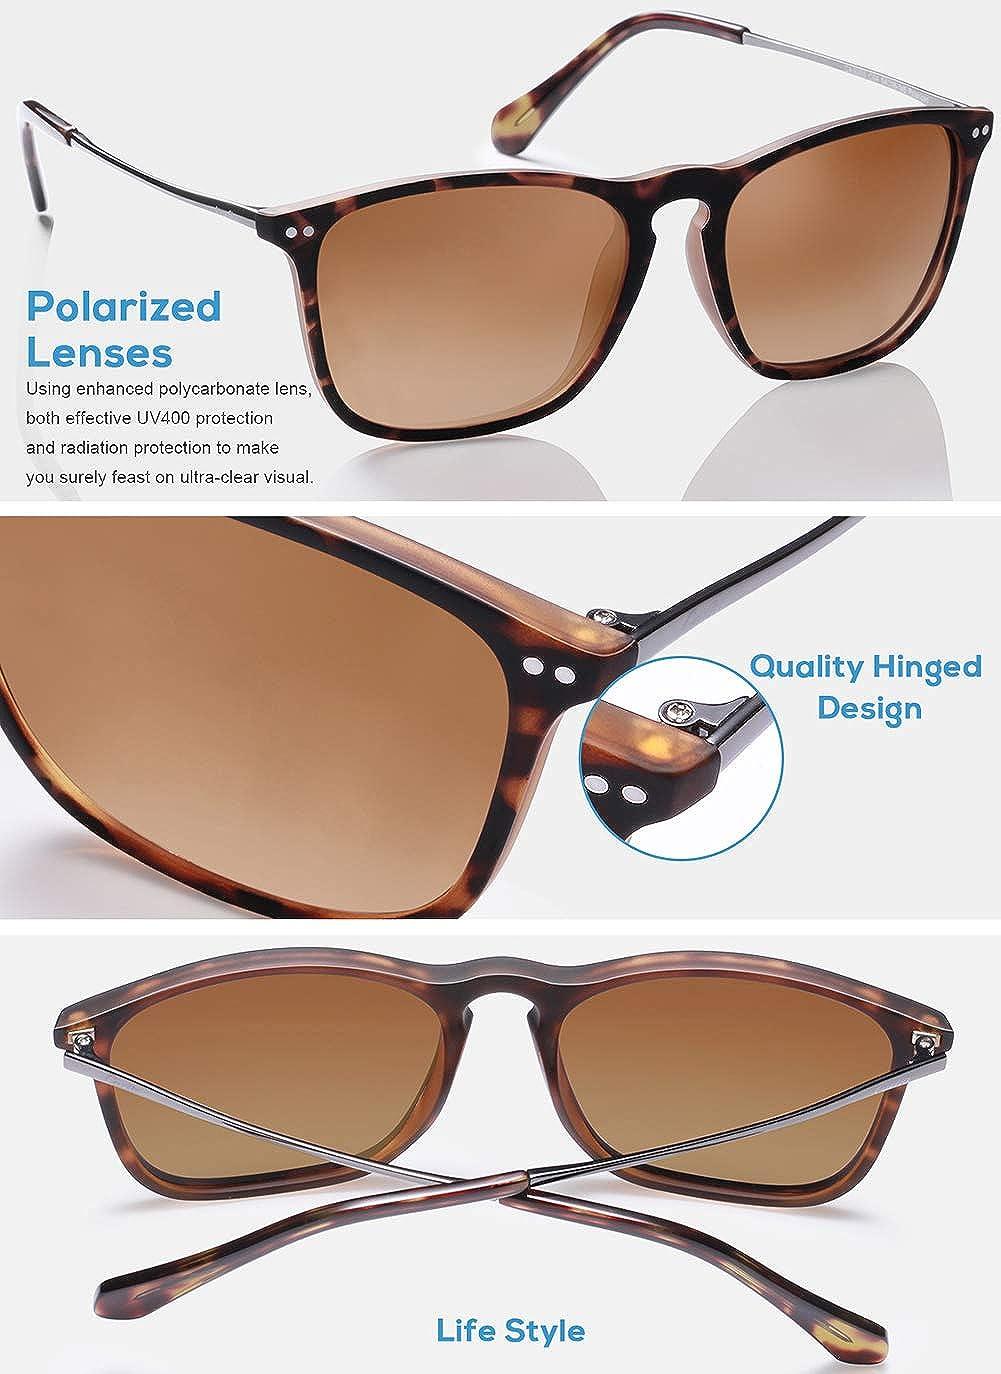 Amazon.com: Carfia anteojos estilo vintage polarizados para ...